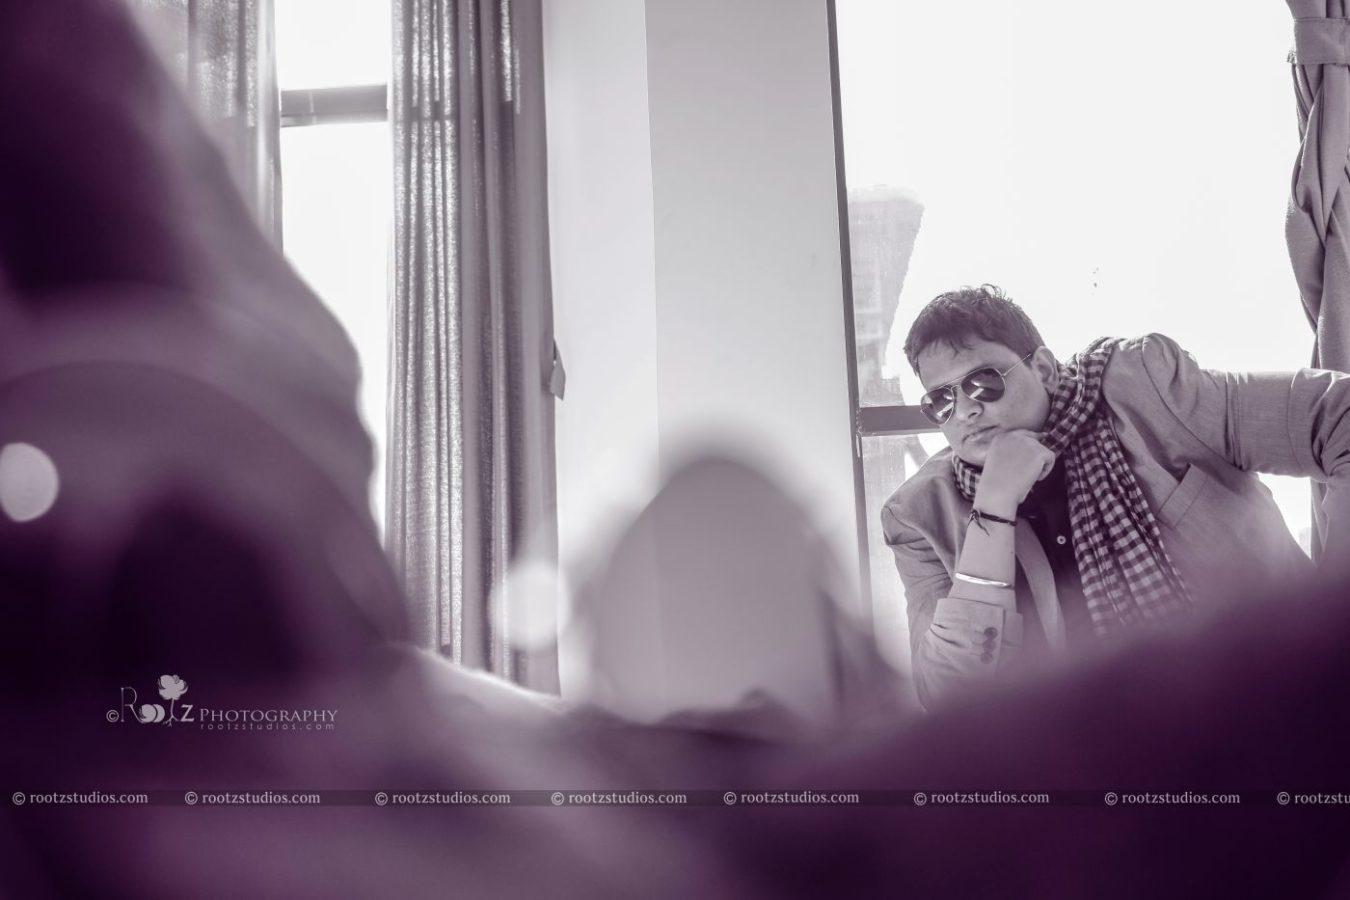 Sendhil Raja - Portrait photography (2)